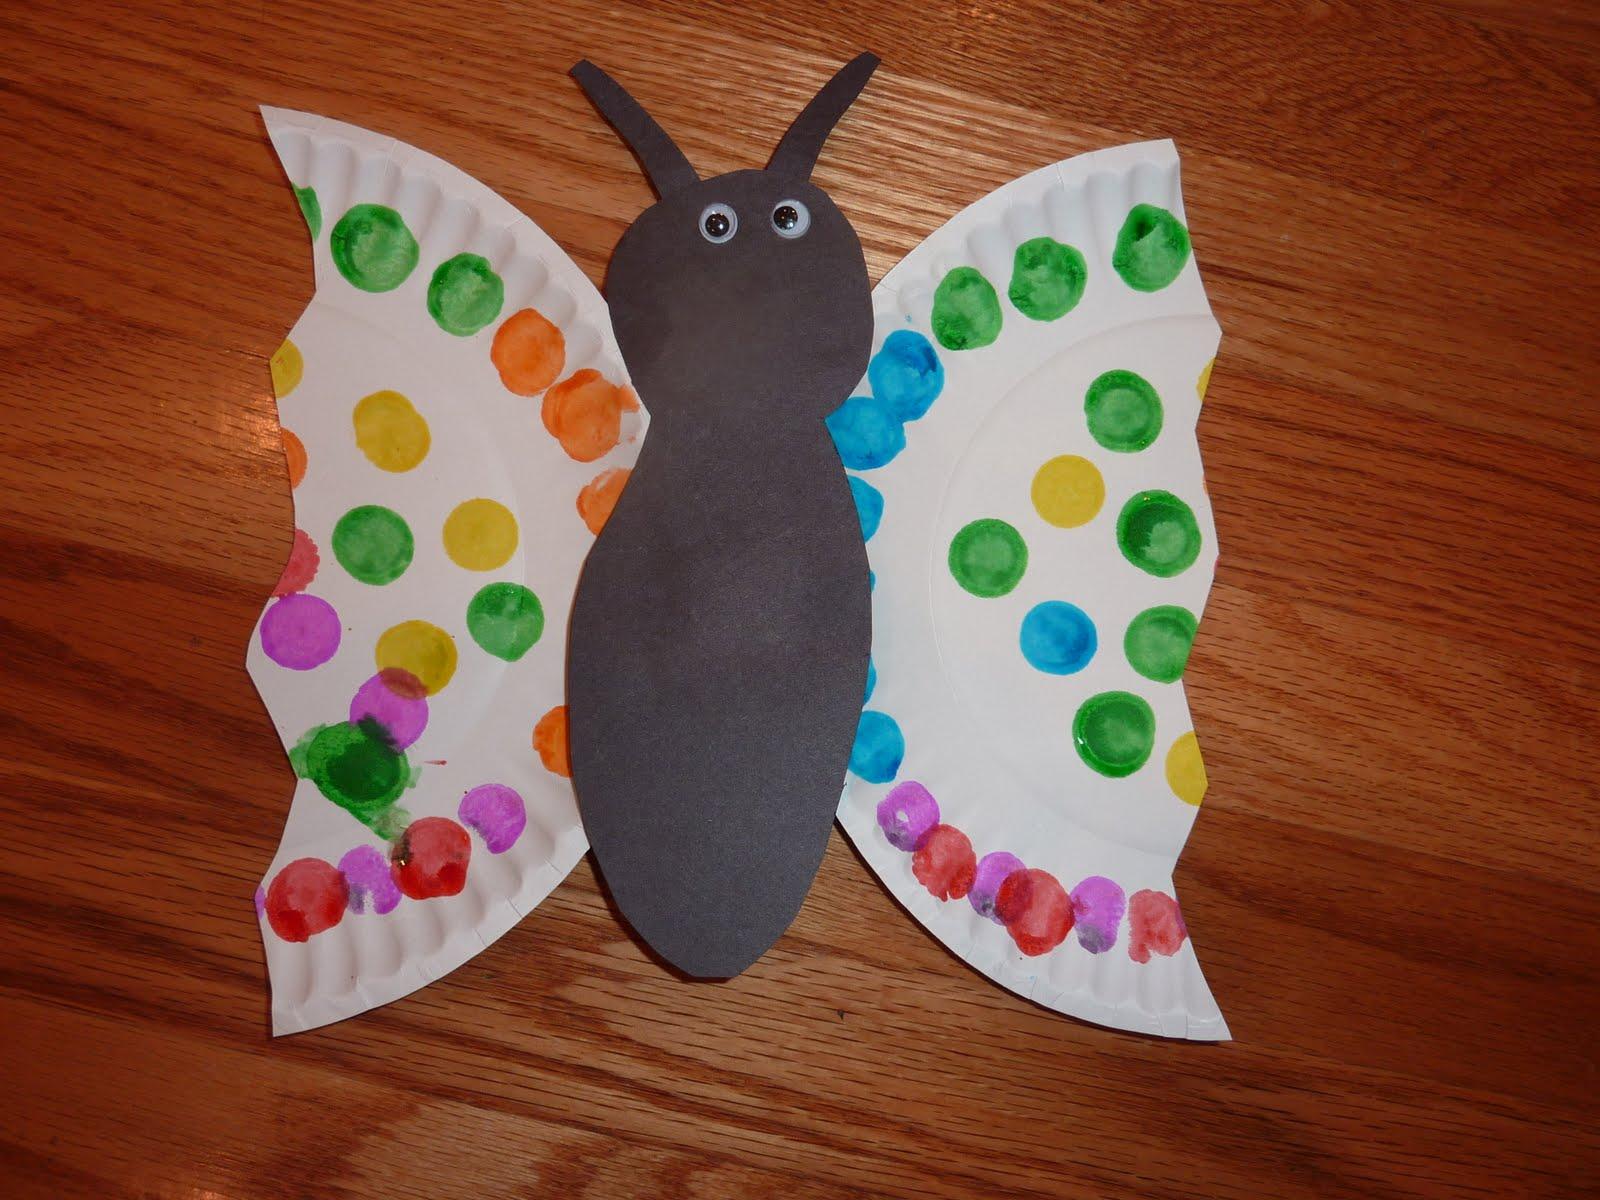 Ramblings of a Crazy Woman: Easy Paper Plate Butterflies ...